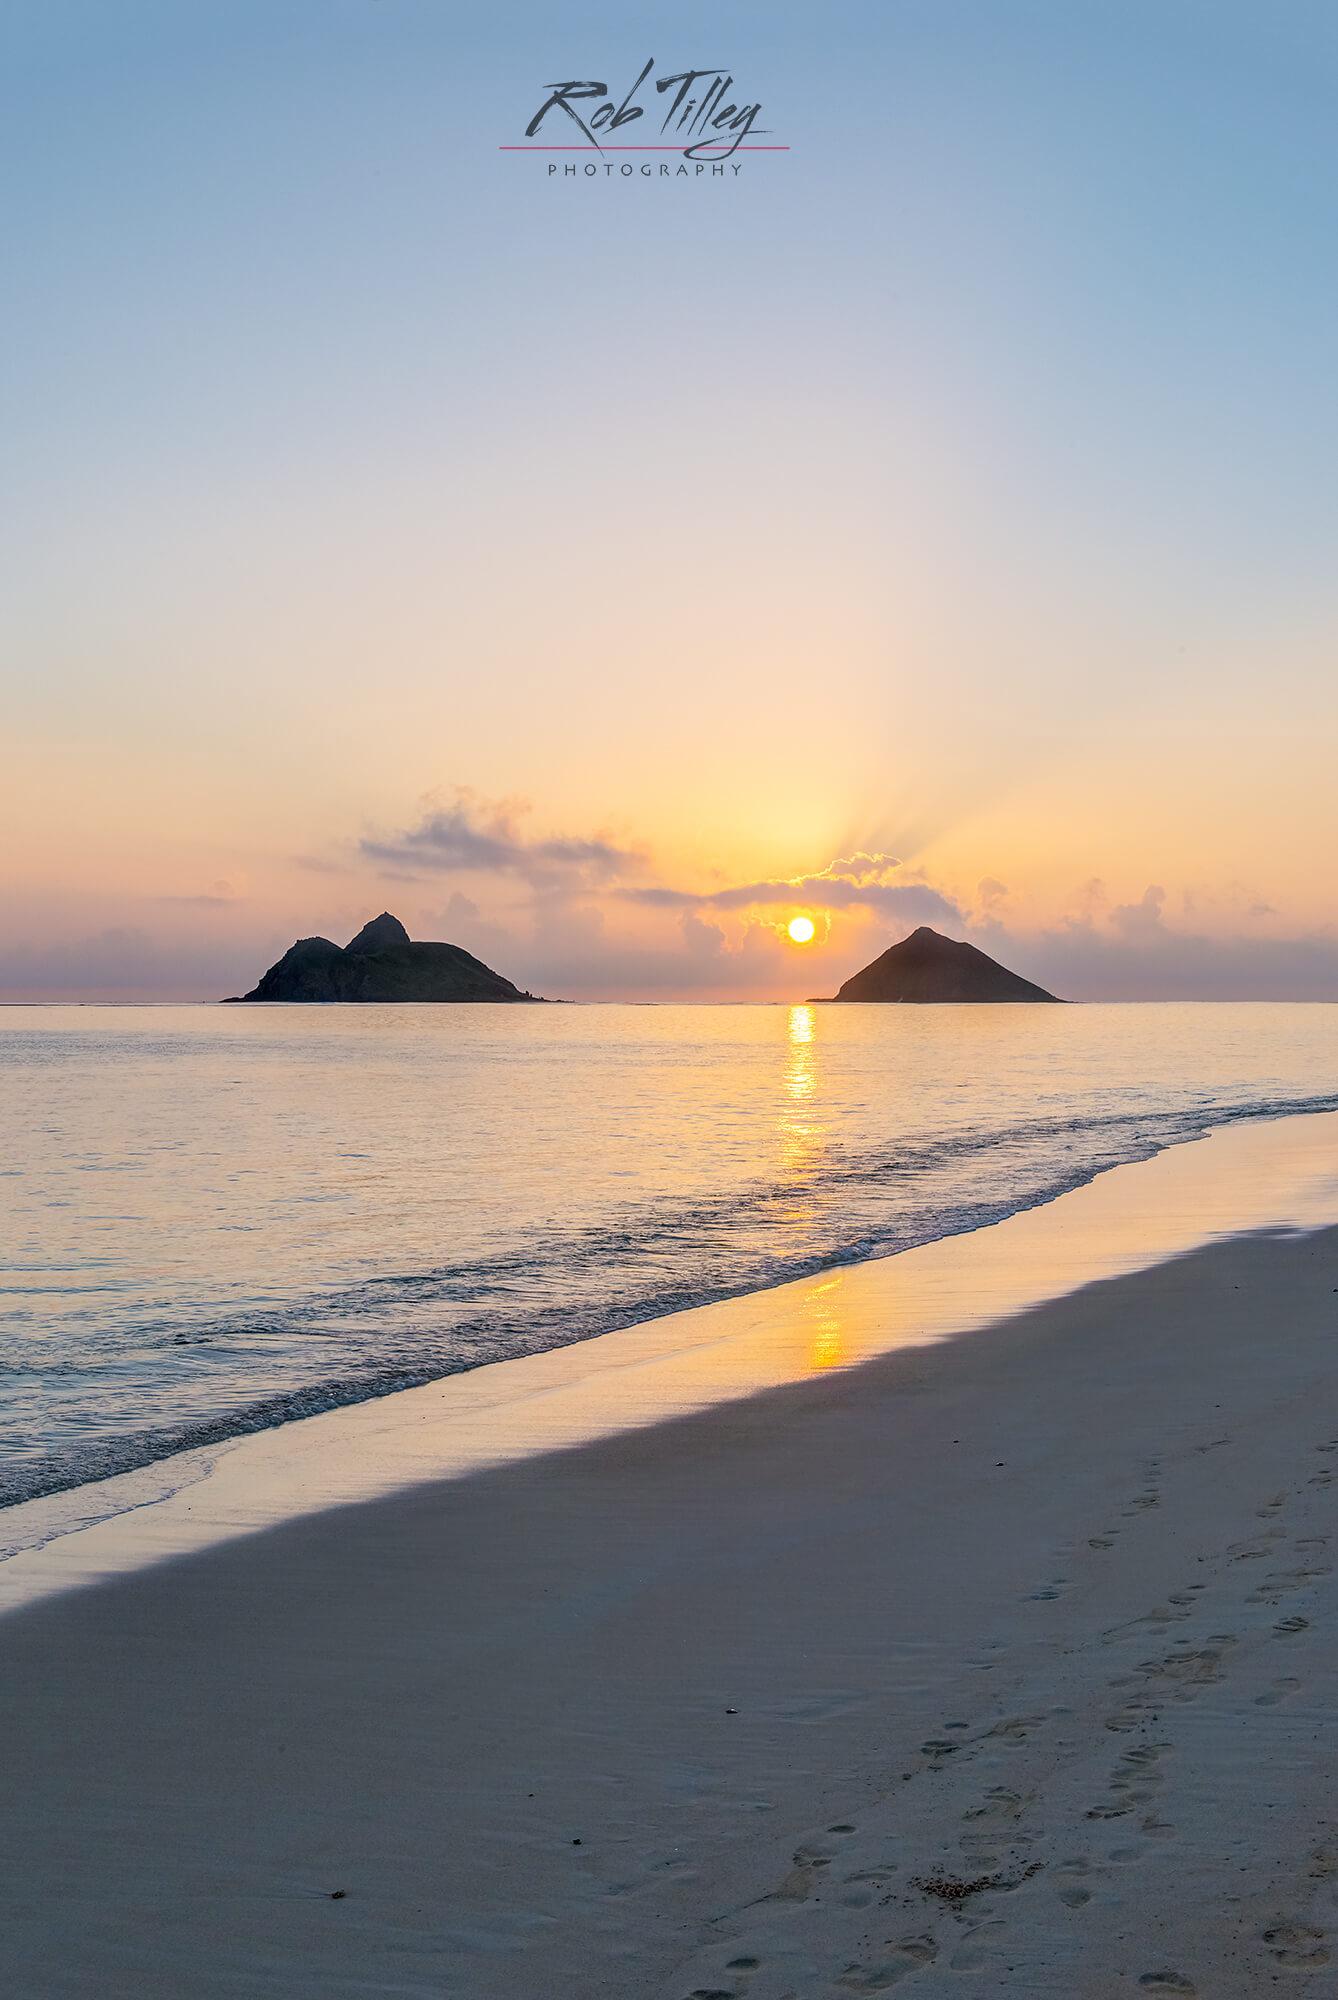 Lanikai Beach Sunrise Ii Rob Tilley Photography